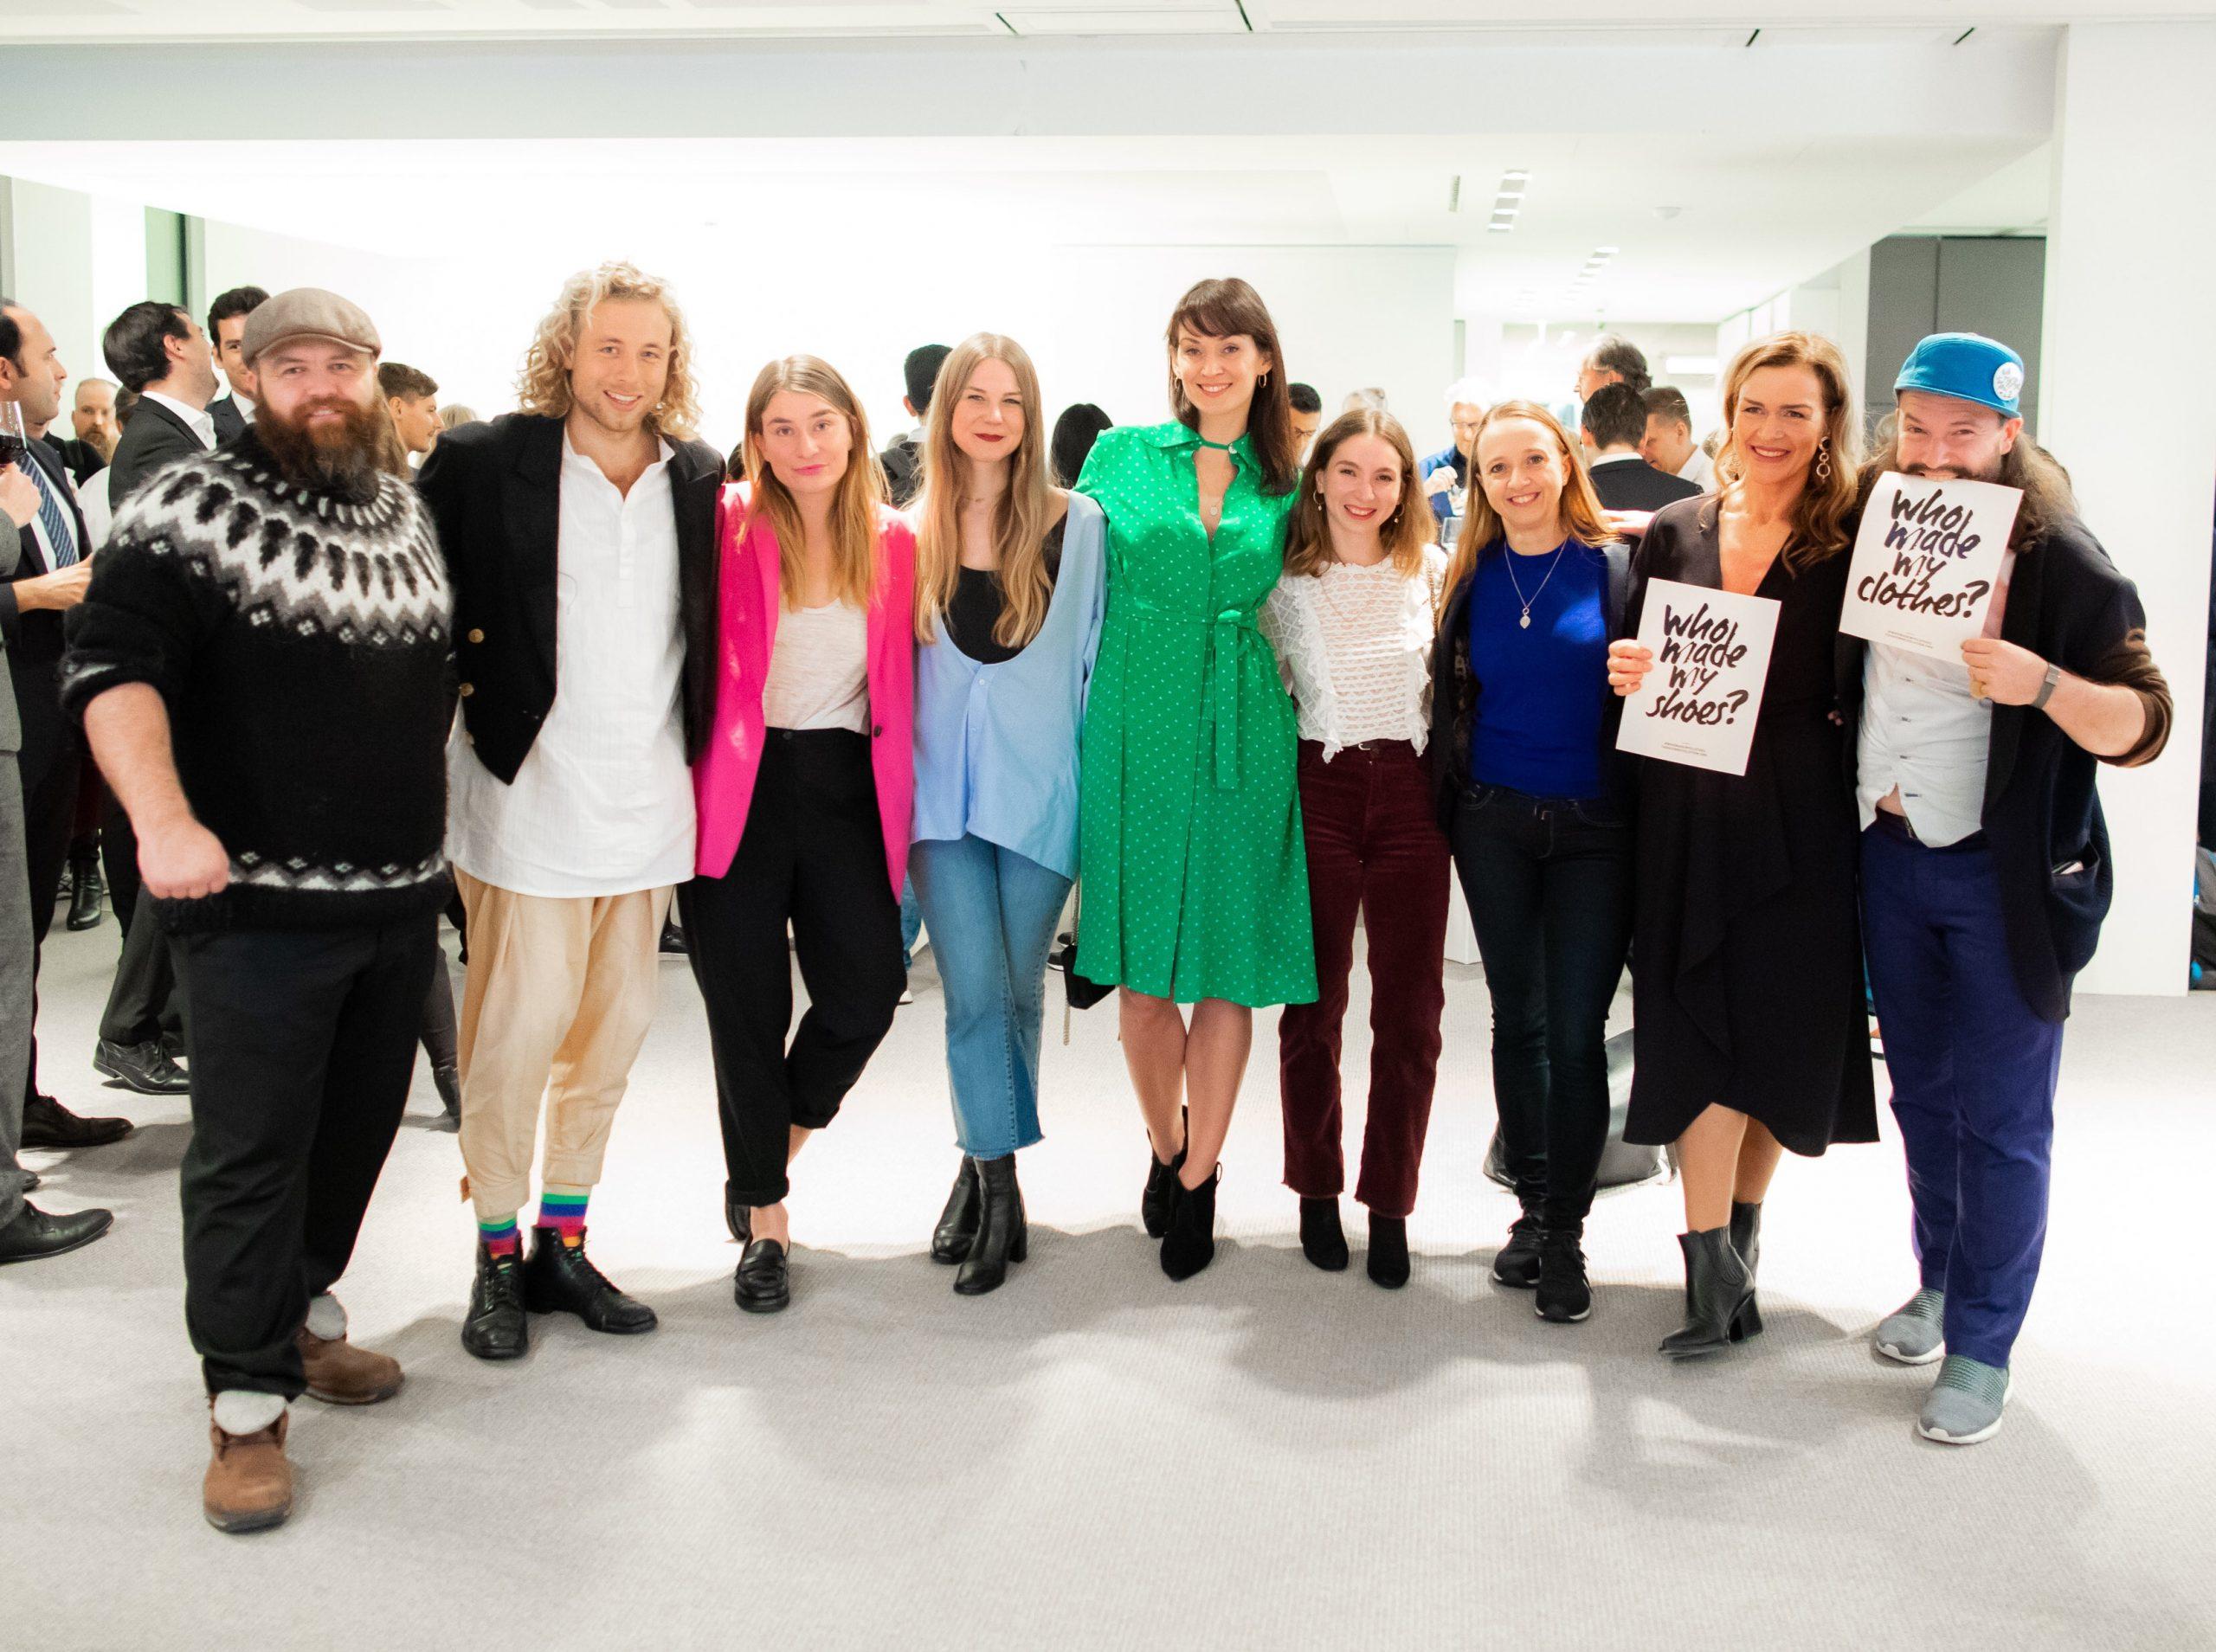 fashion_revolution_dusseldorf_event_2019_nov-2